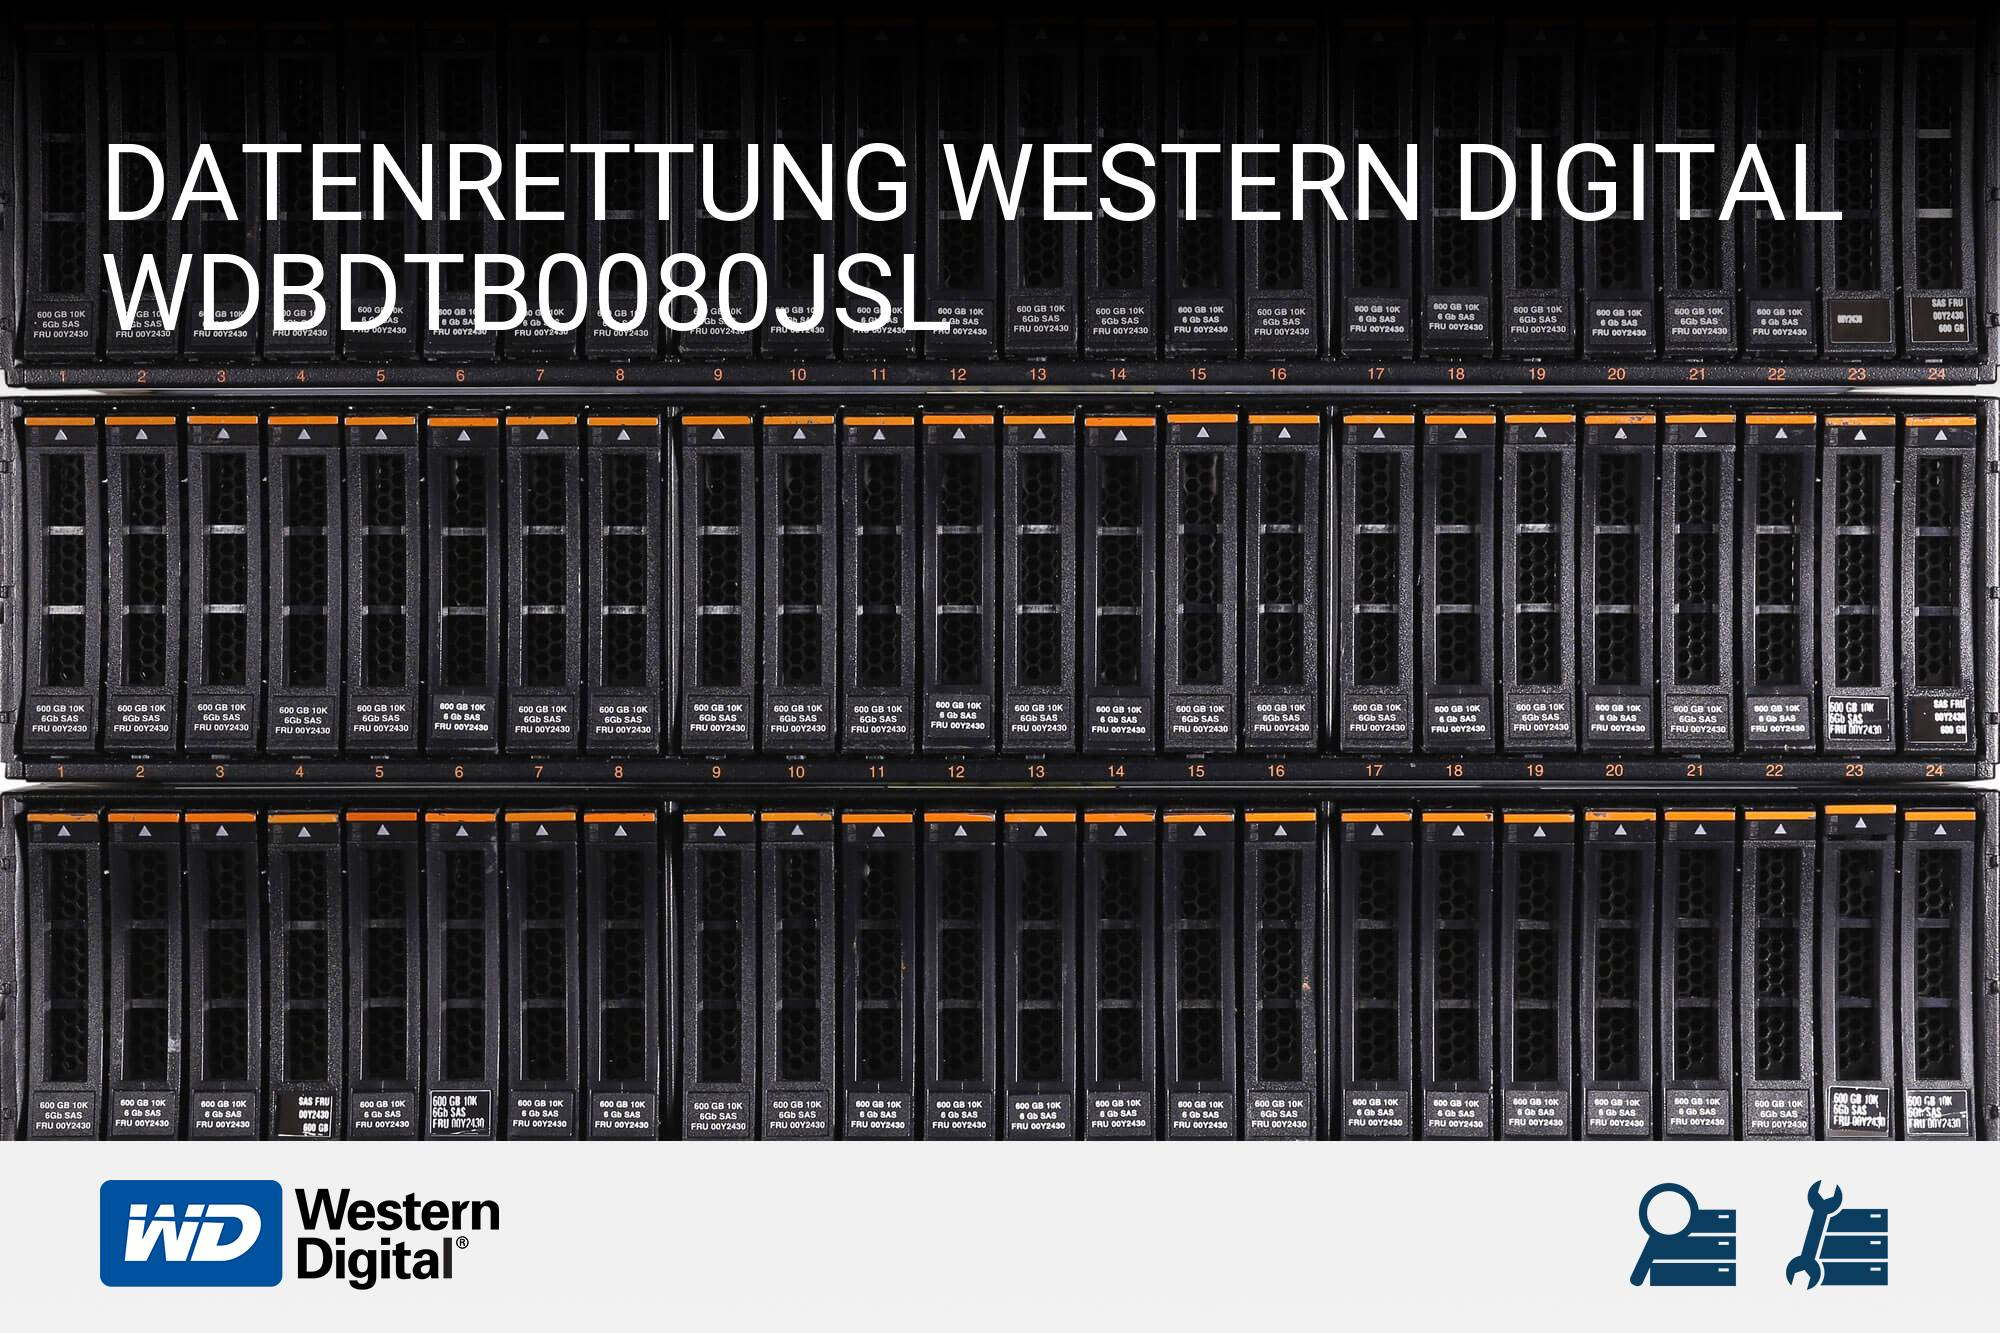 Western Digital WDBDTB0080JSL